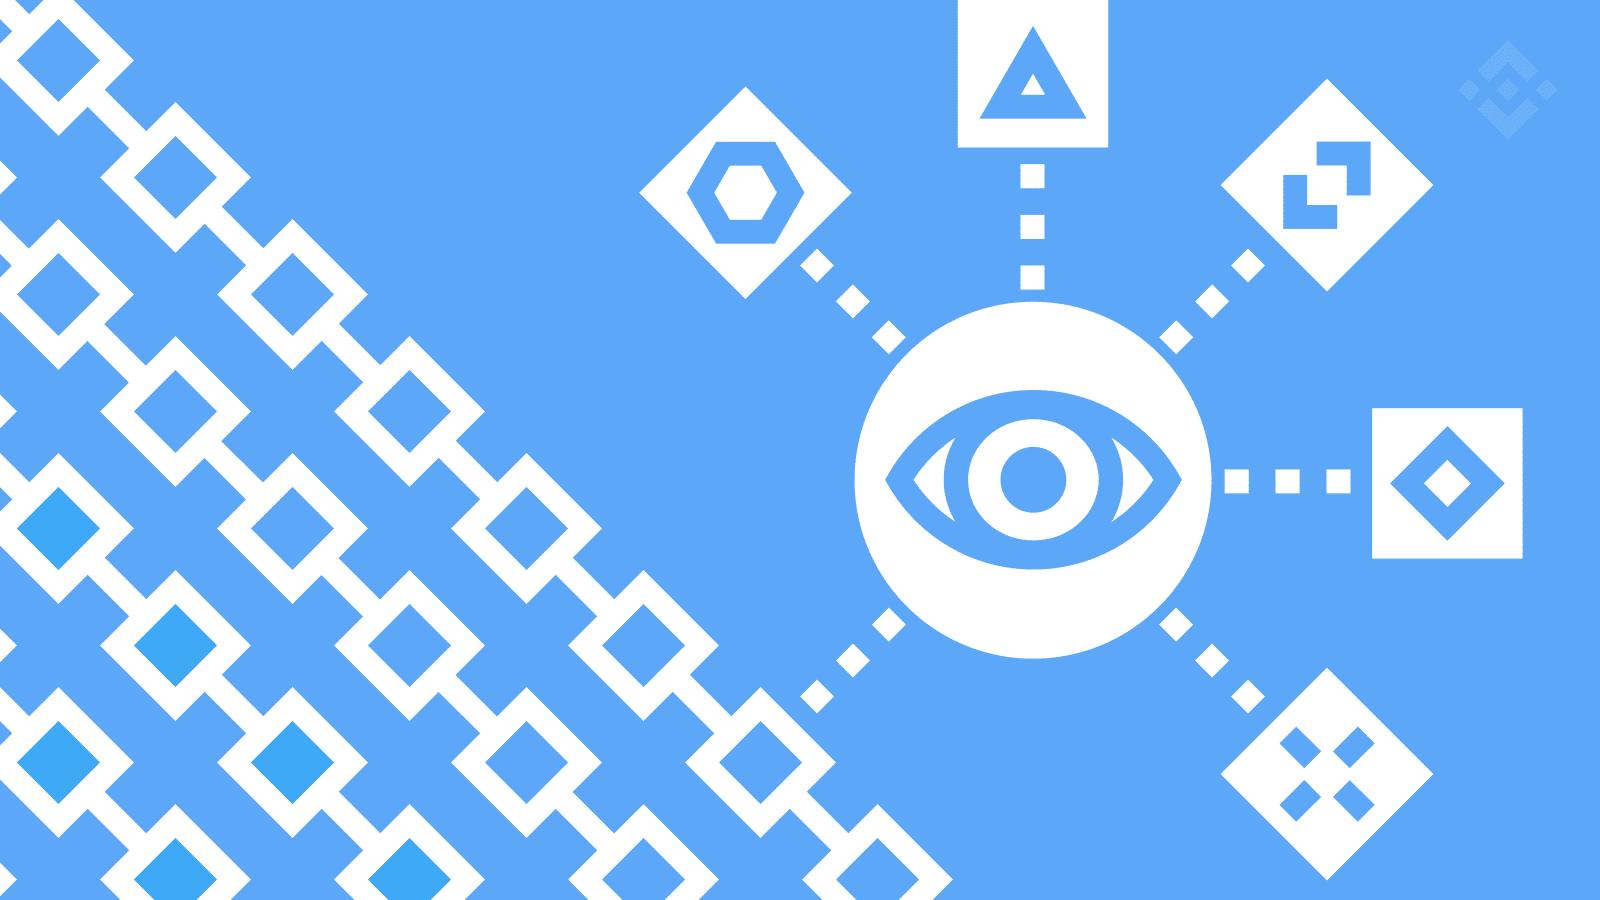 02.05.20 Blockchain oracles